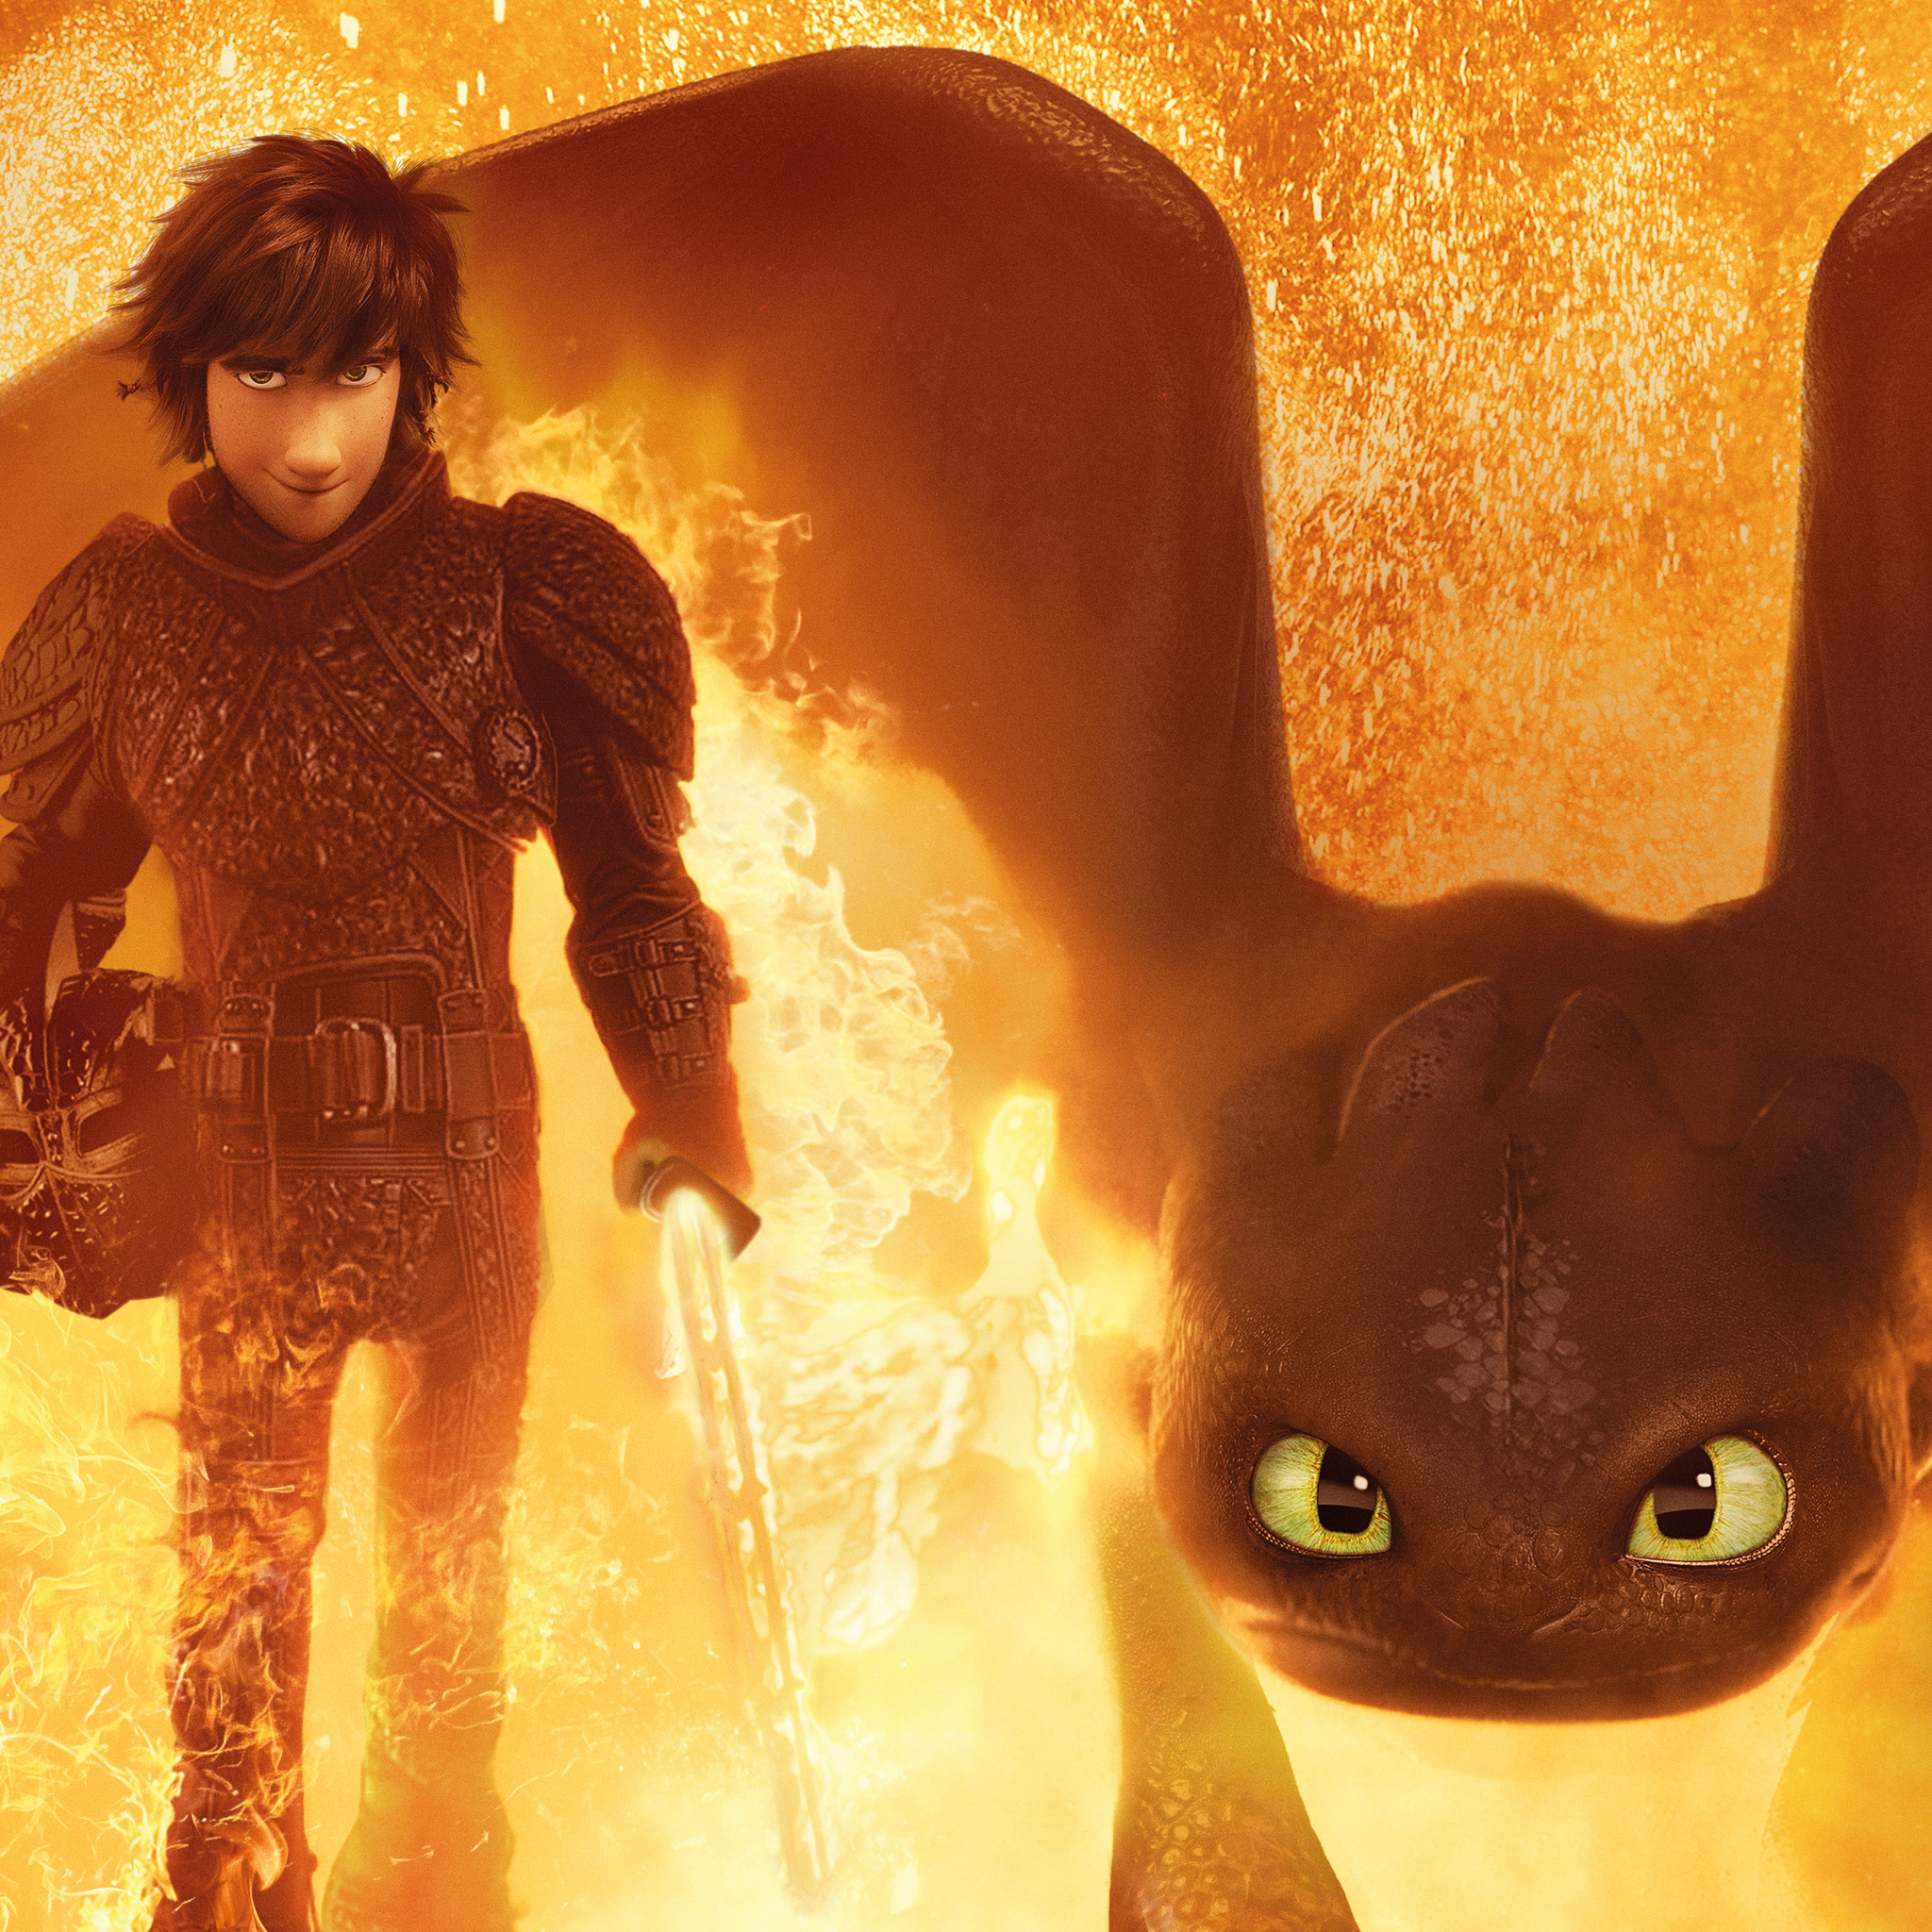 how-to-train-your-dragon-the-hidden-world-4k-2019-2h.jpg